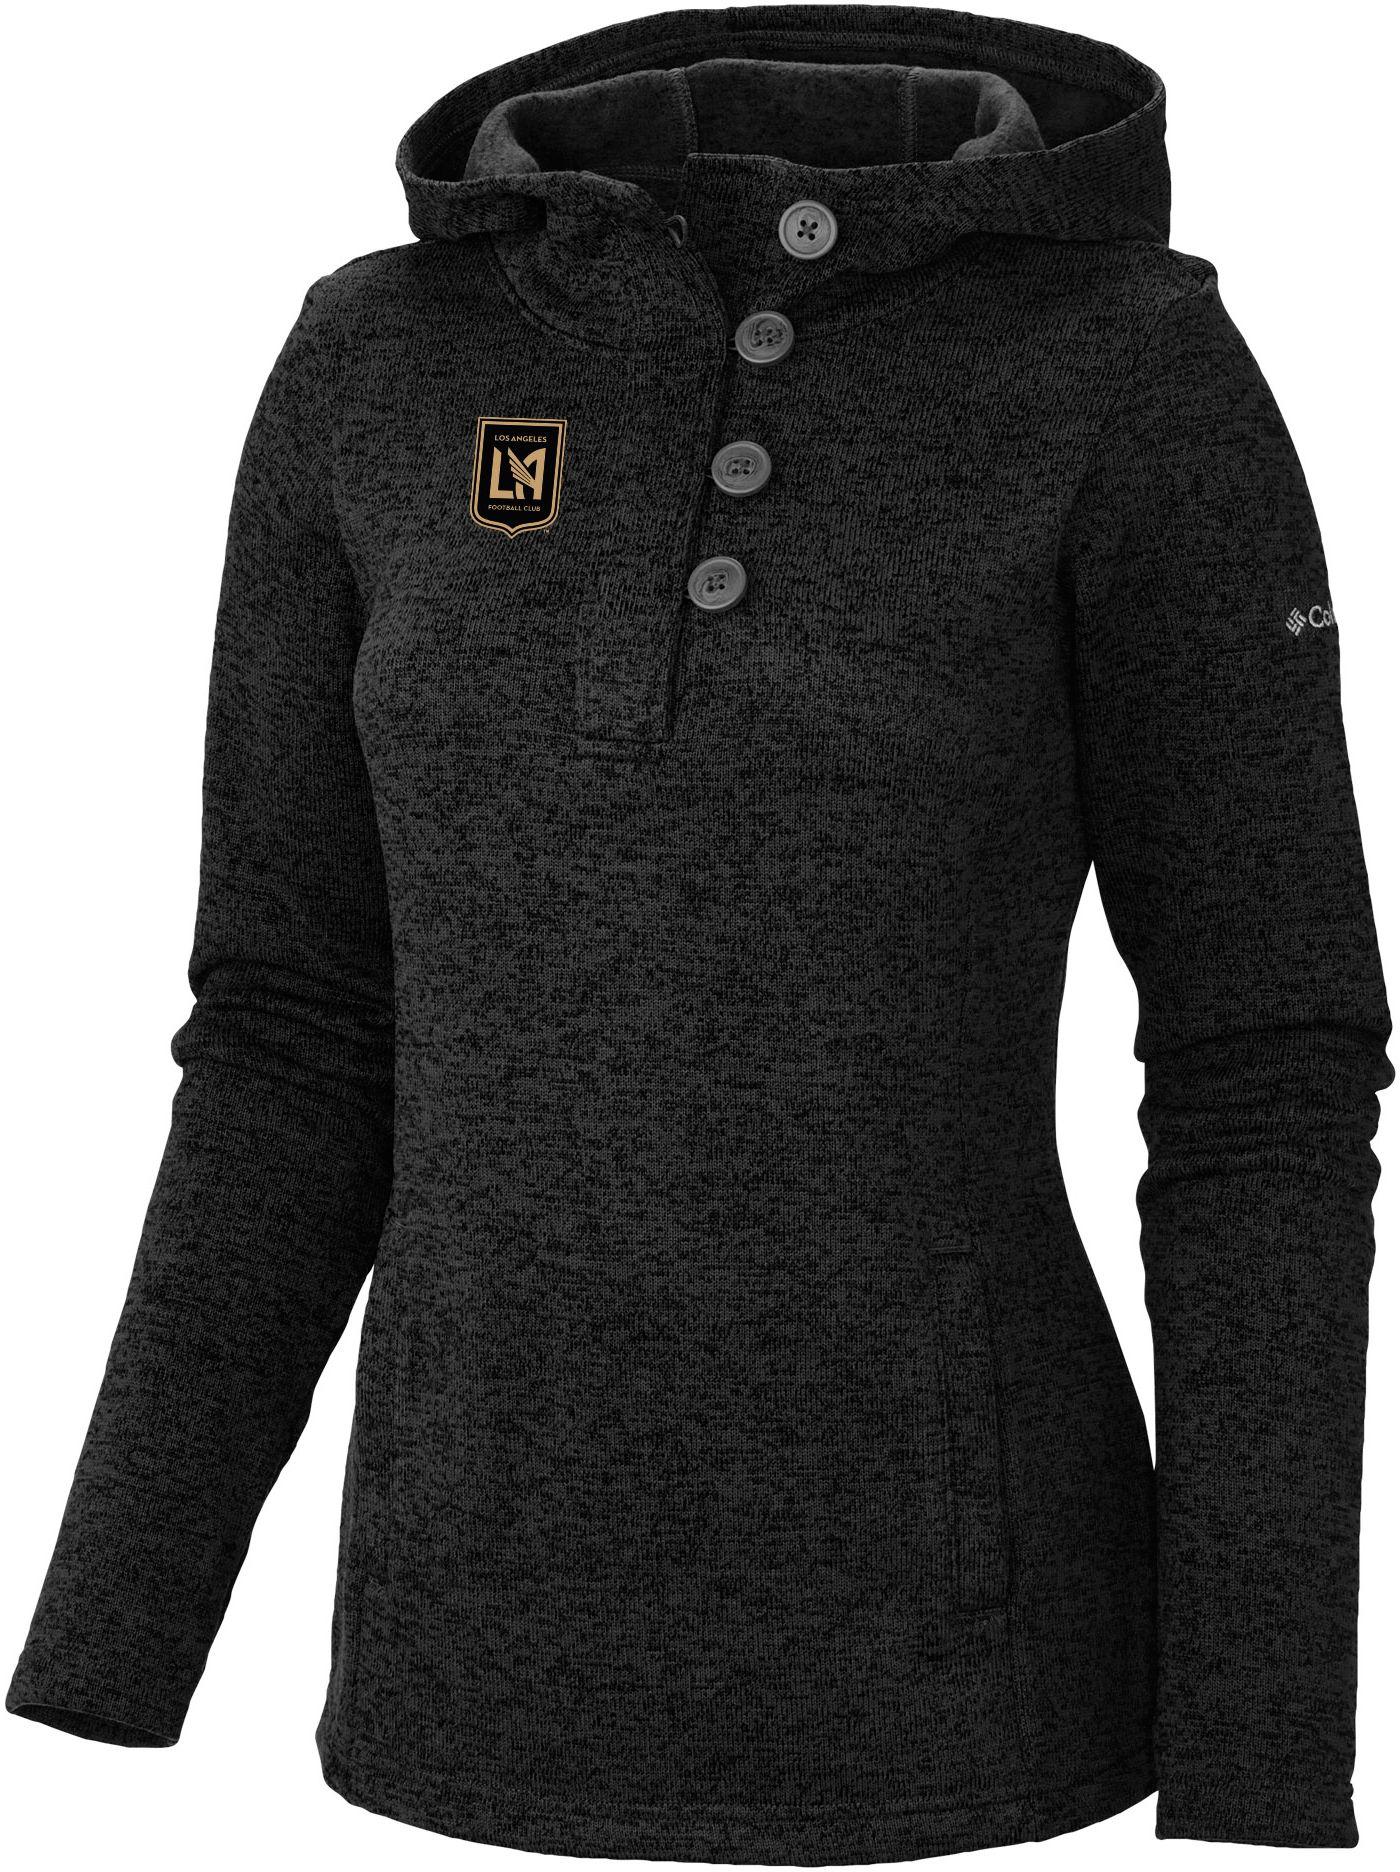 Columbia Women's Los Angeles FC Darling Days Black Heathered Pullover Sweatshirt